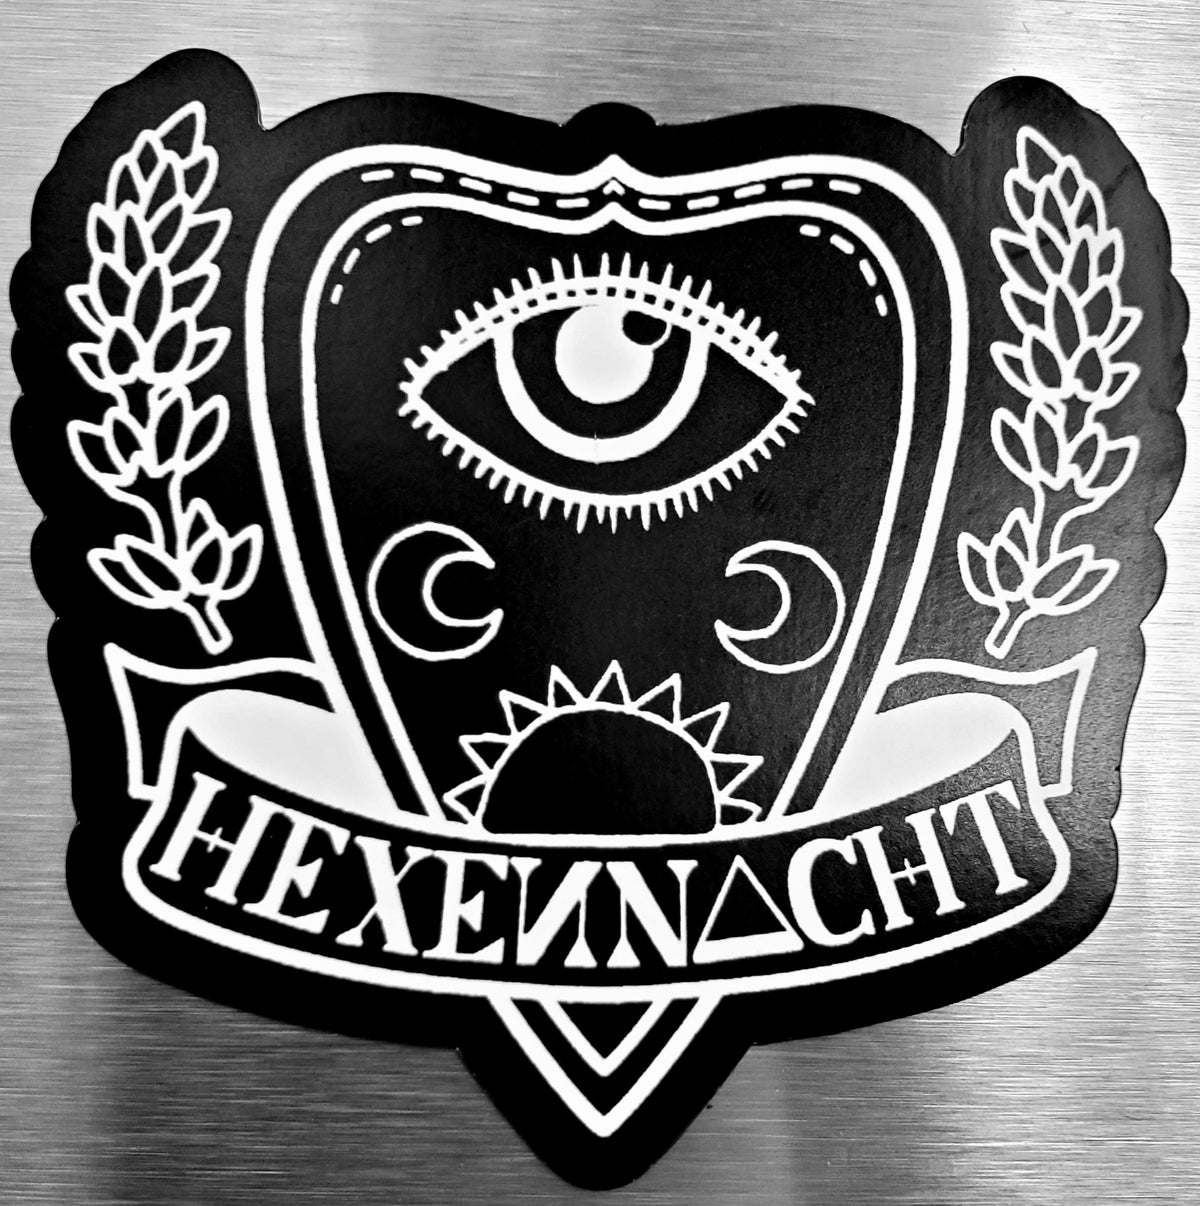 Image of hexennacht planchette-logo magnet